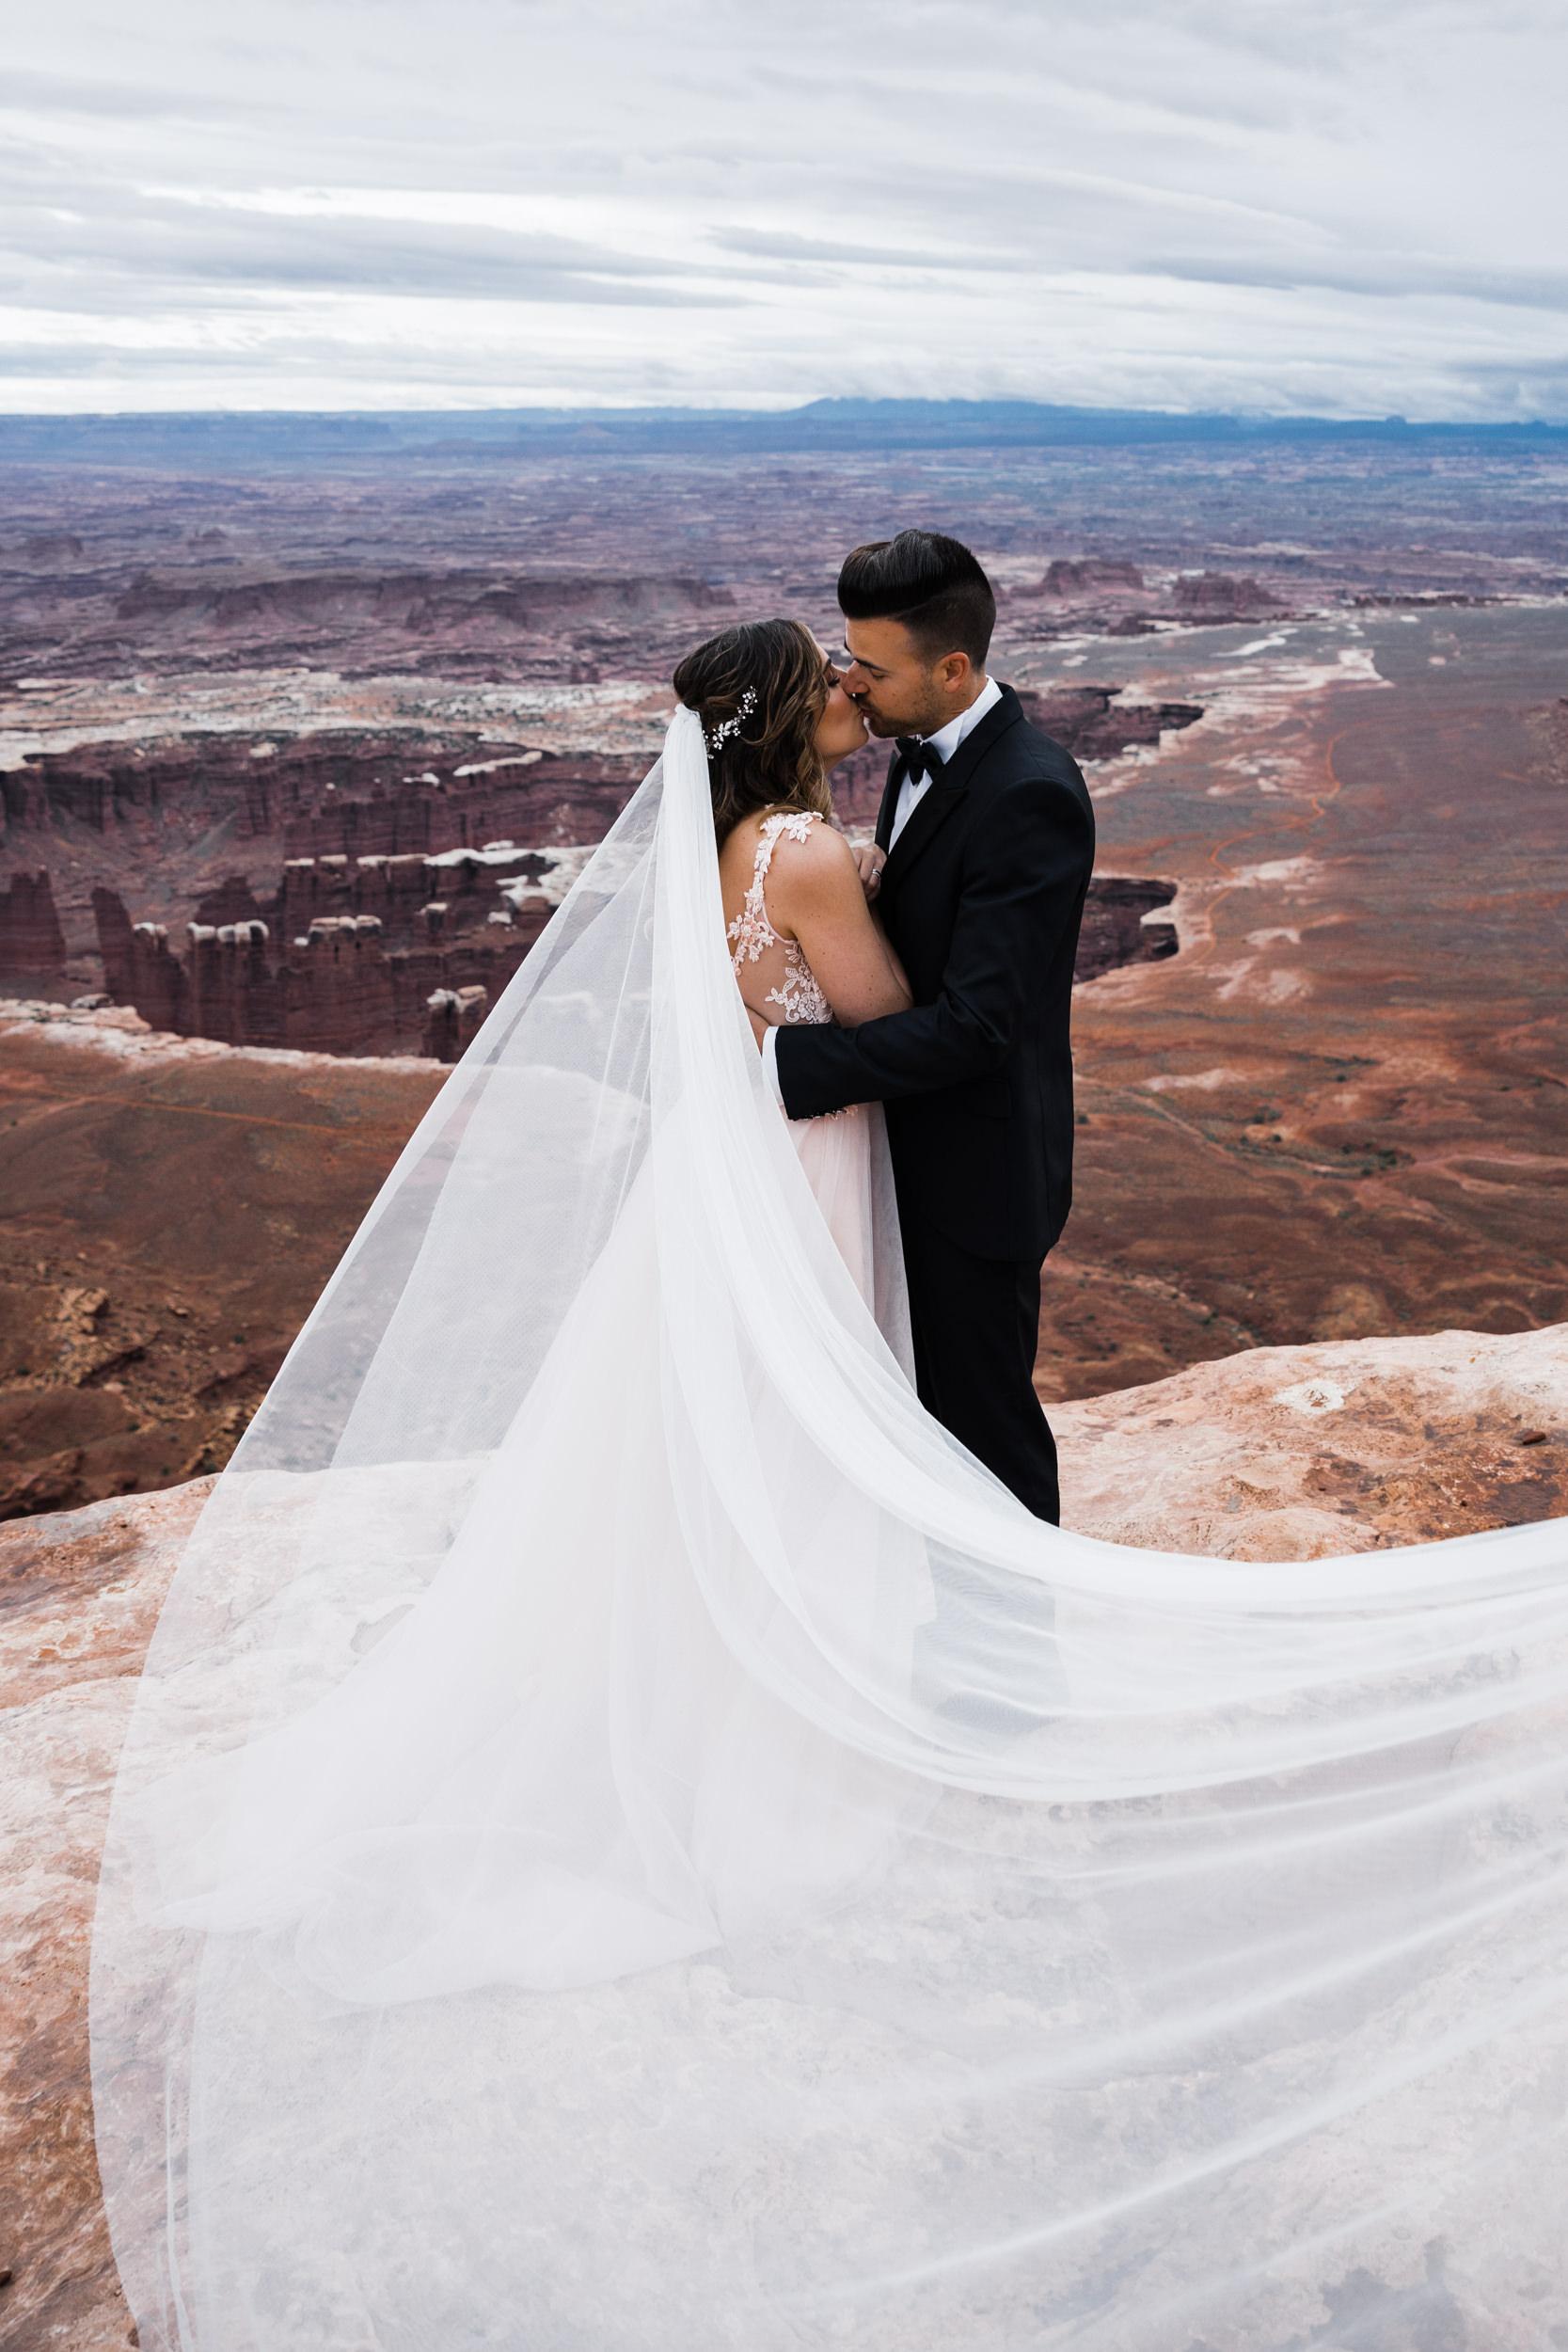 Hearnes-Elopement-Photography-Canyonlands-National-Park-Moab-Wedding-11.jpg